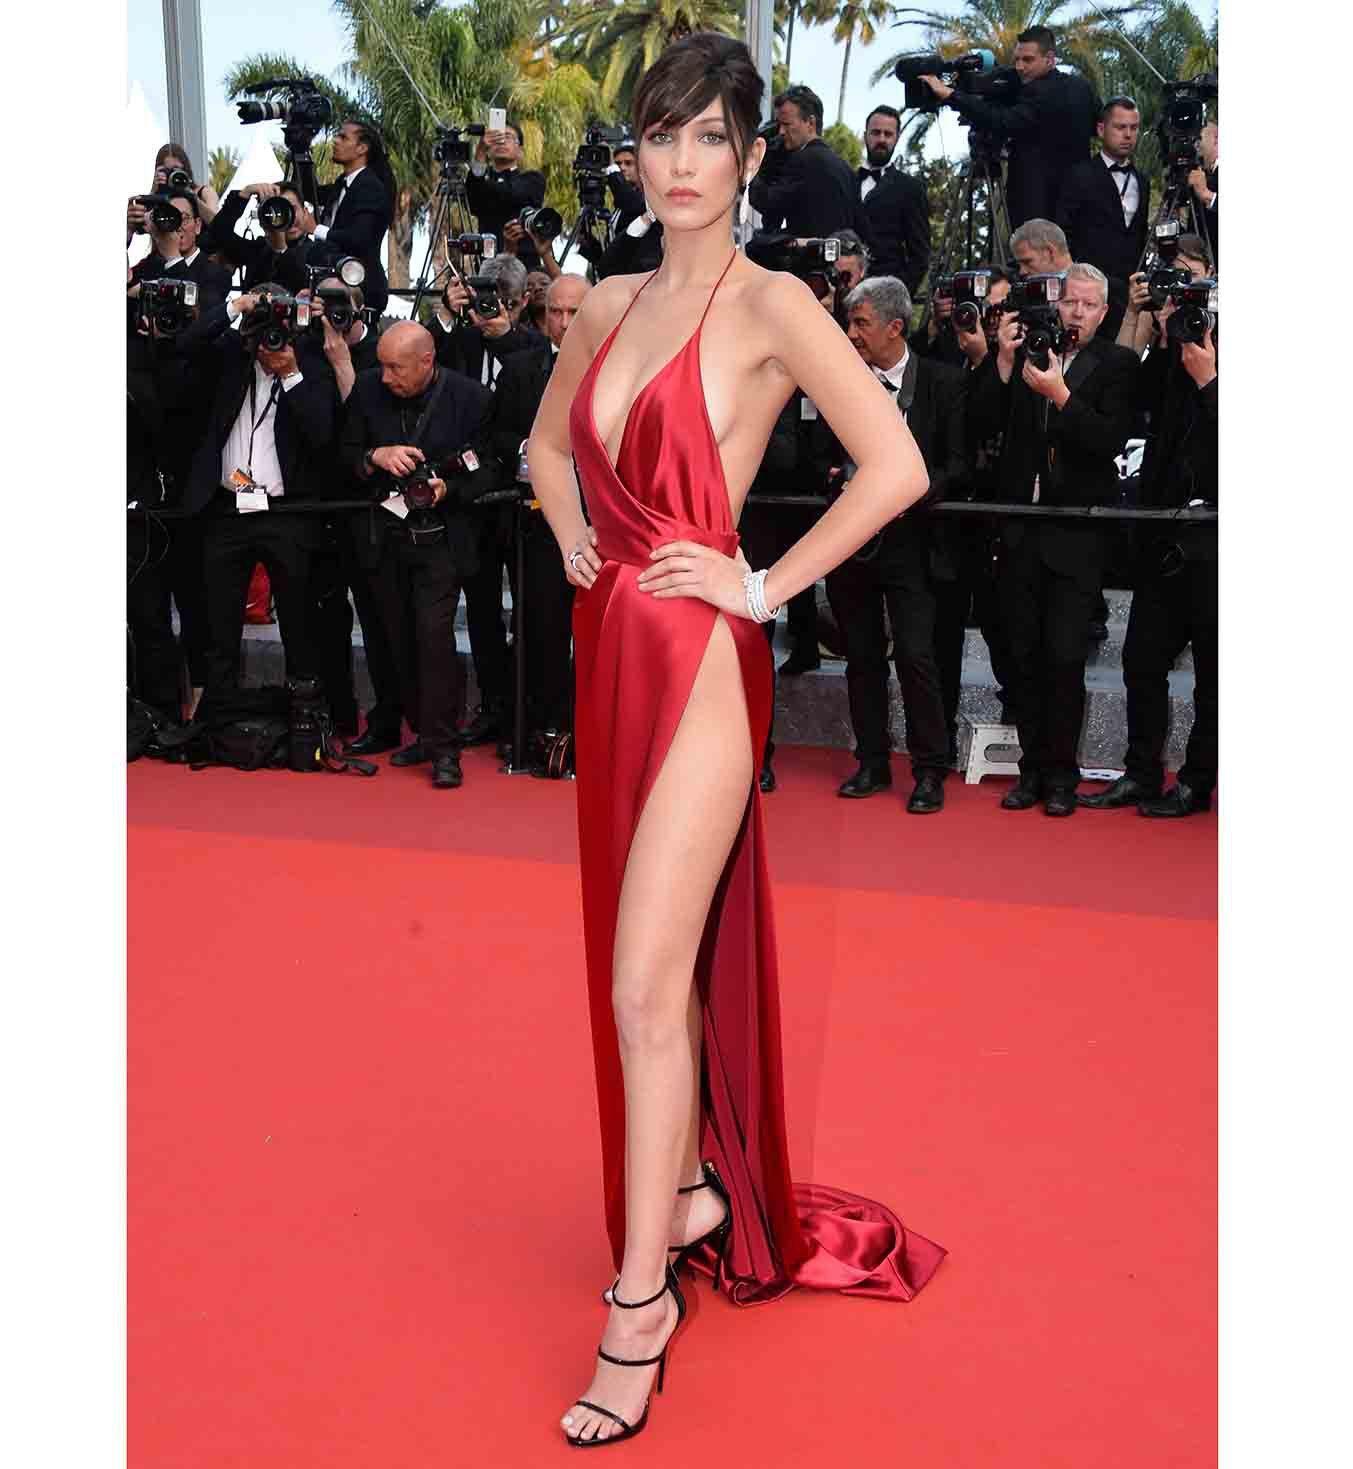 Plus belle robe rouge